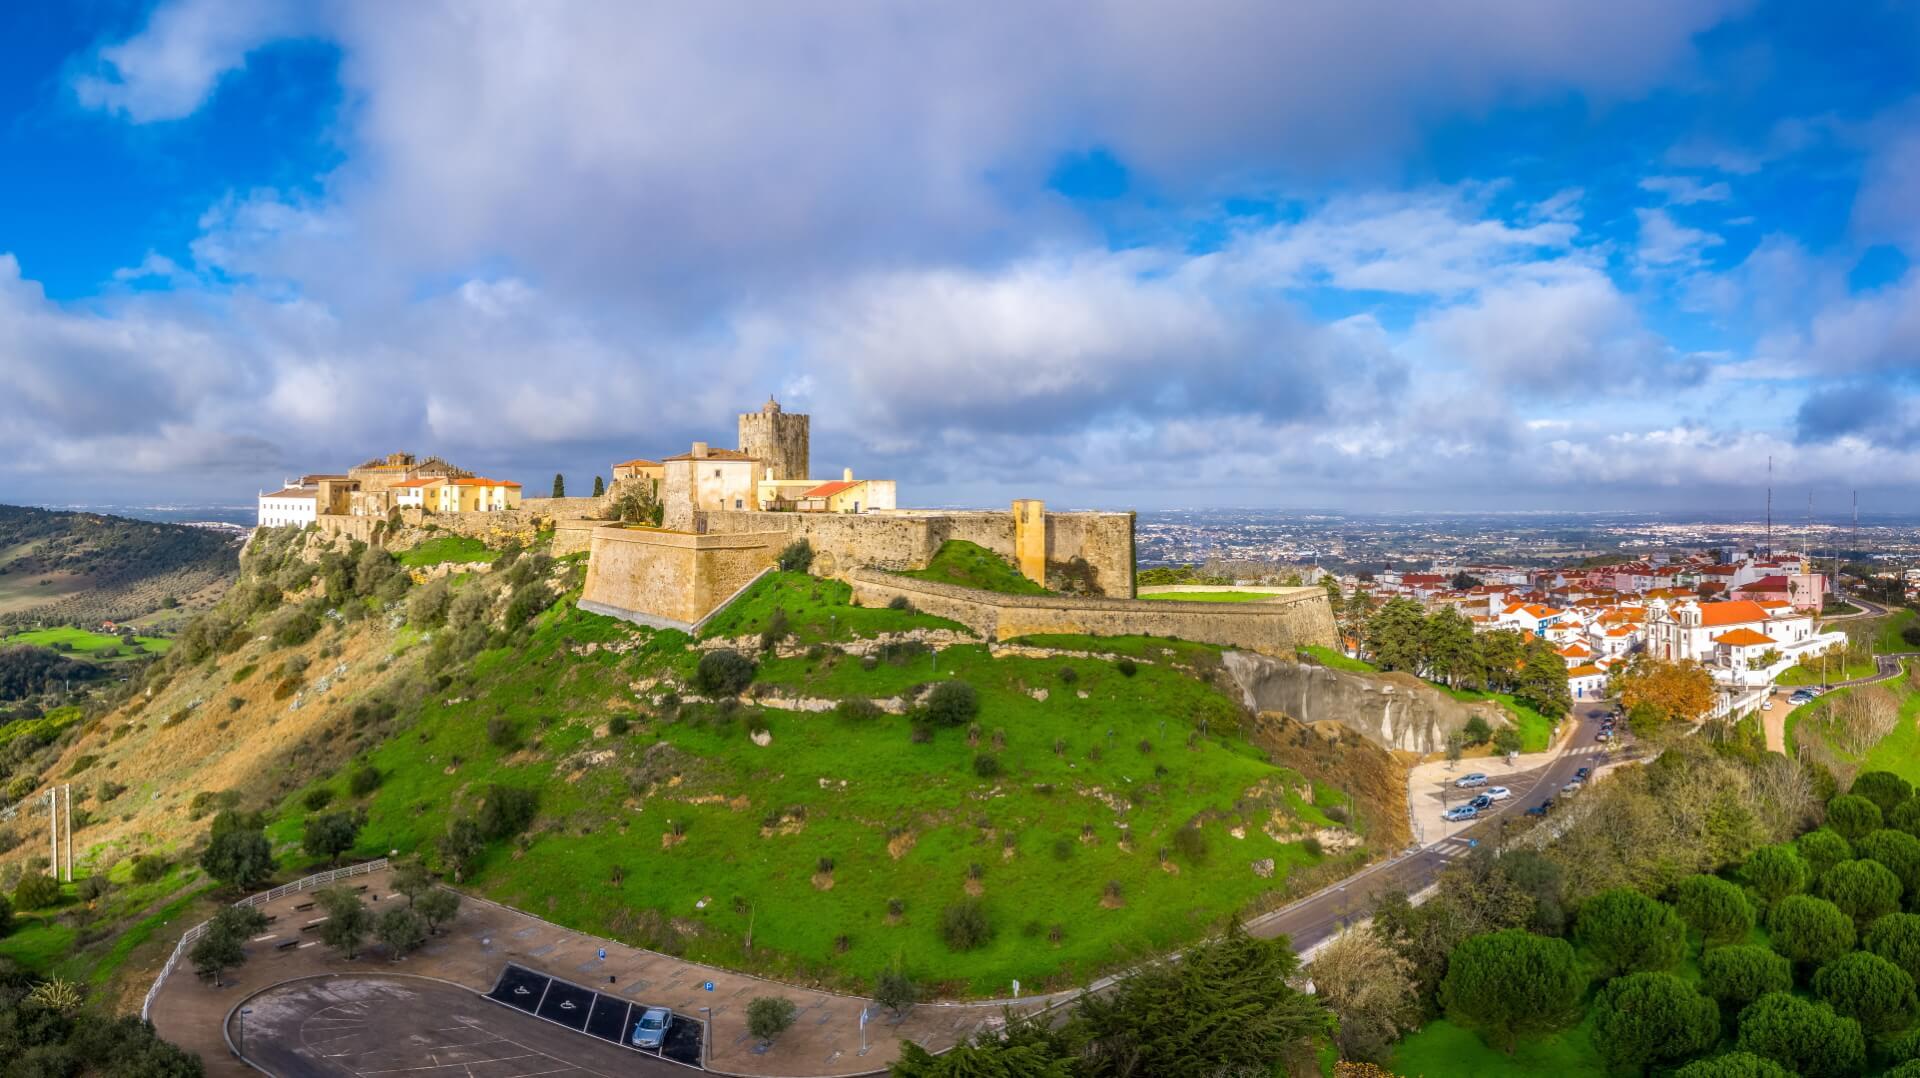 Pousada Portugal - Palmela castle